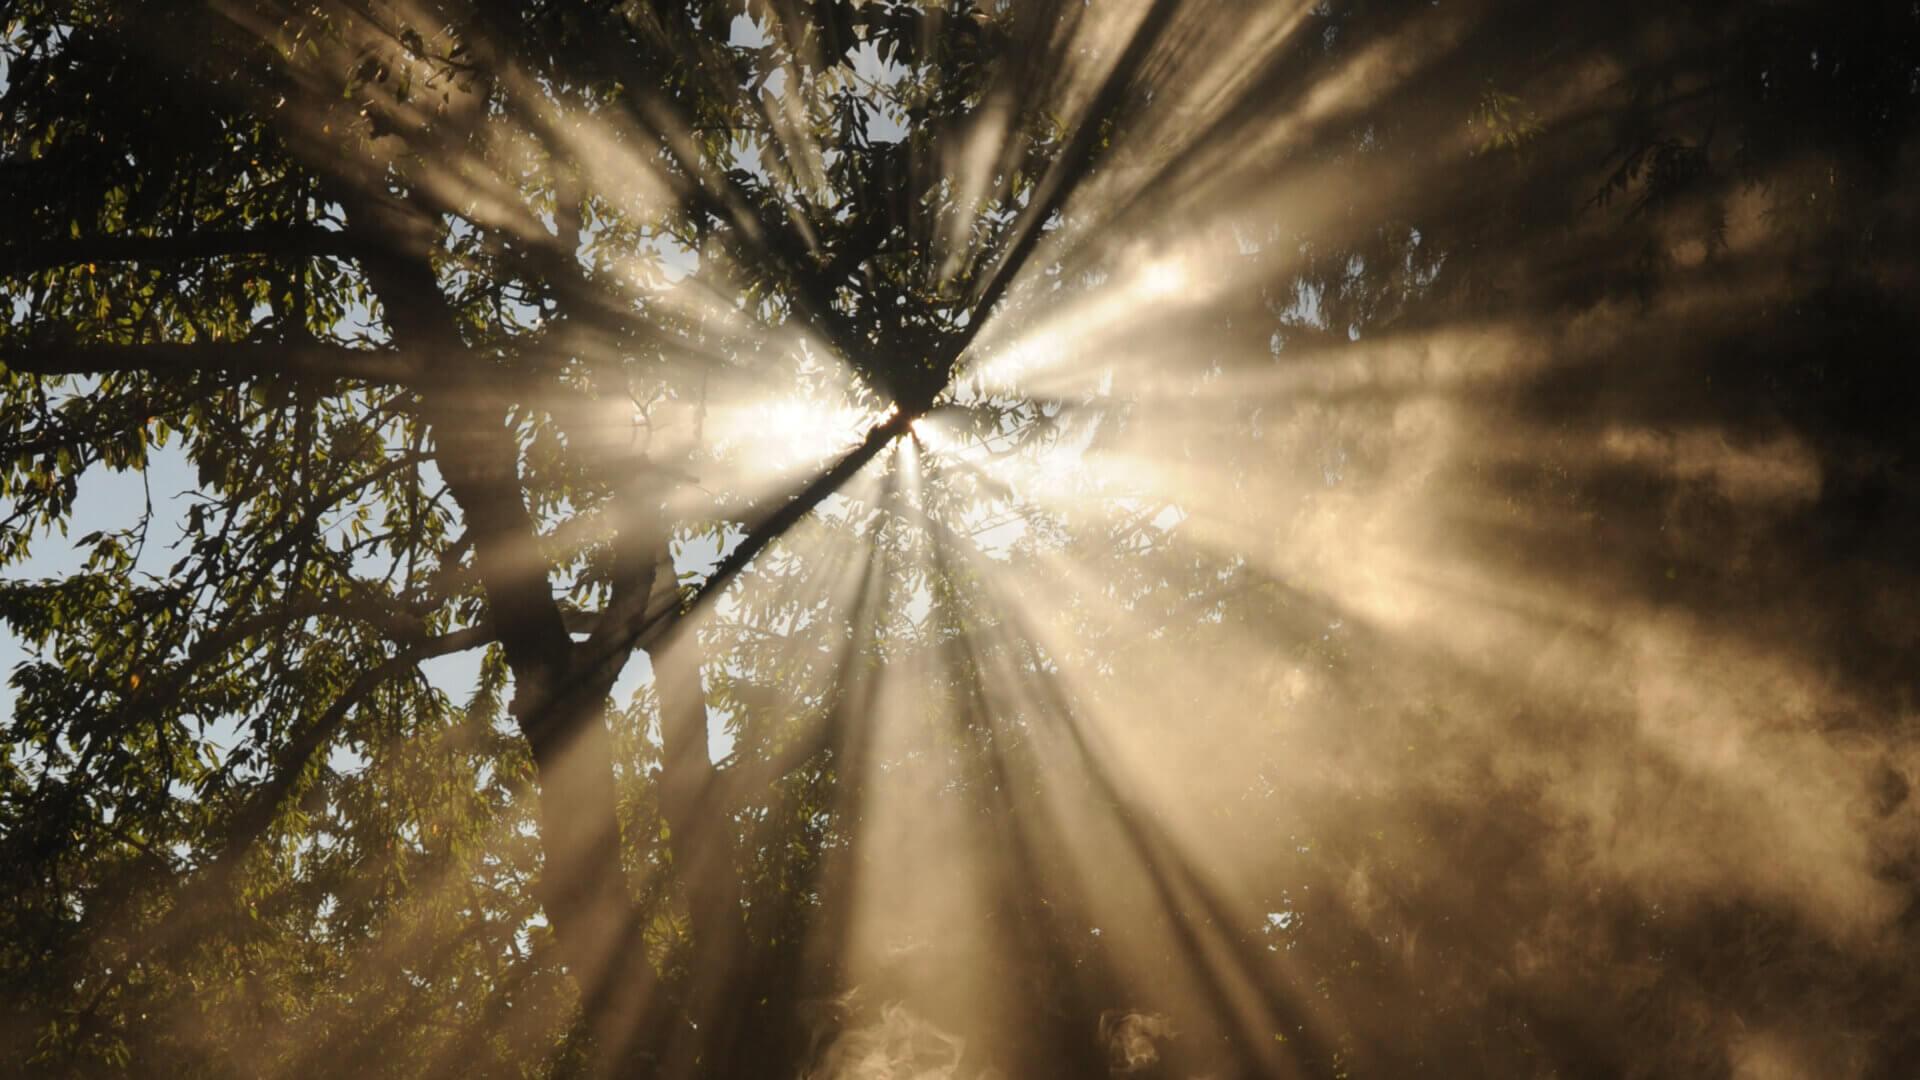 210629_Gebet_glow-Camp_Titelbild